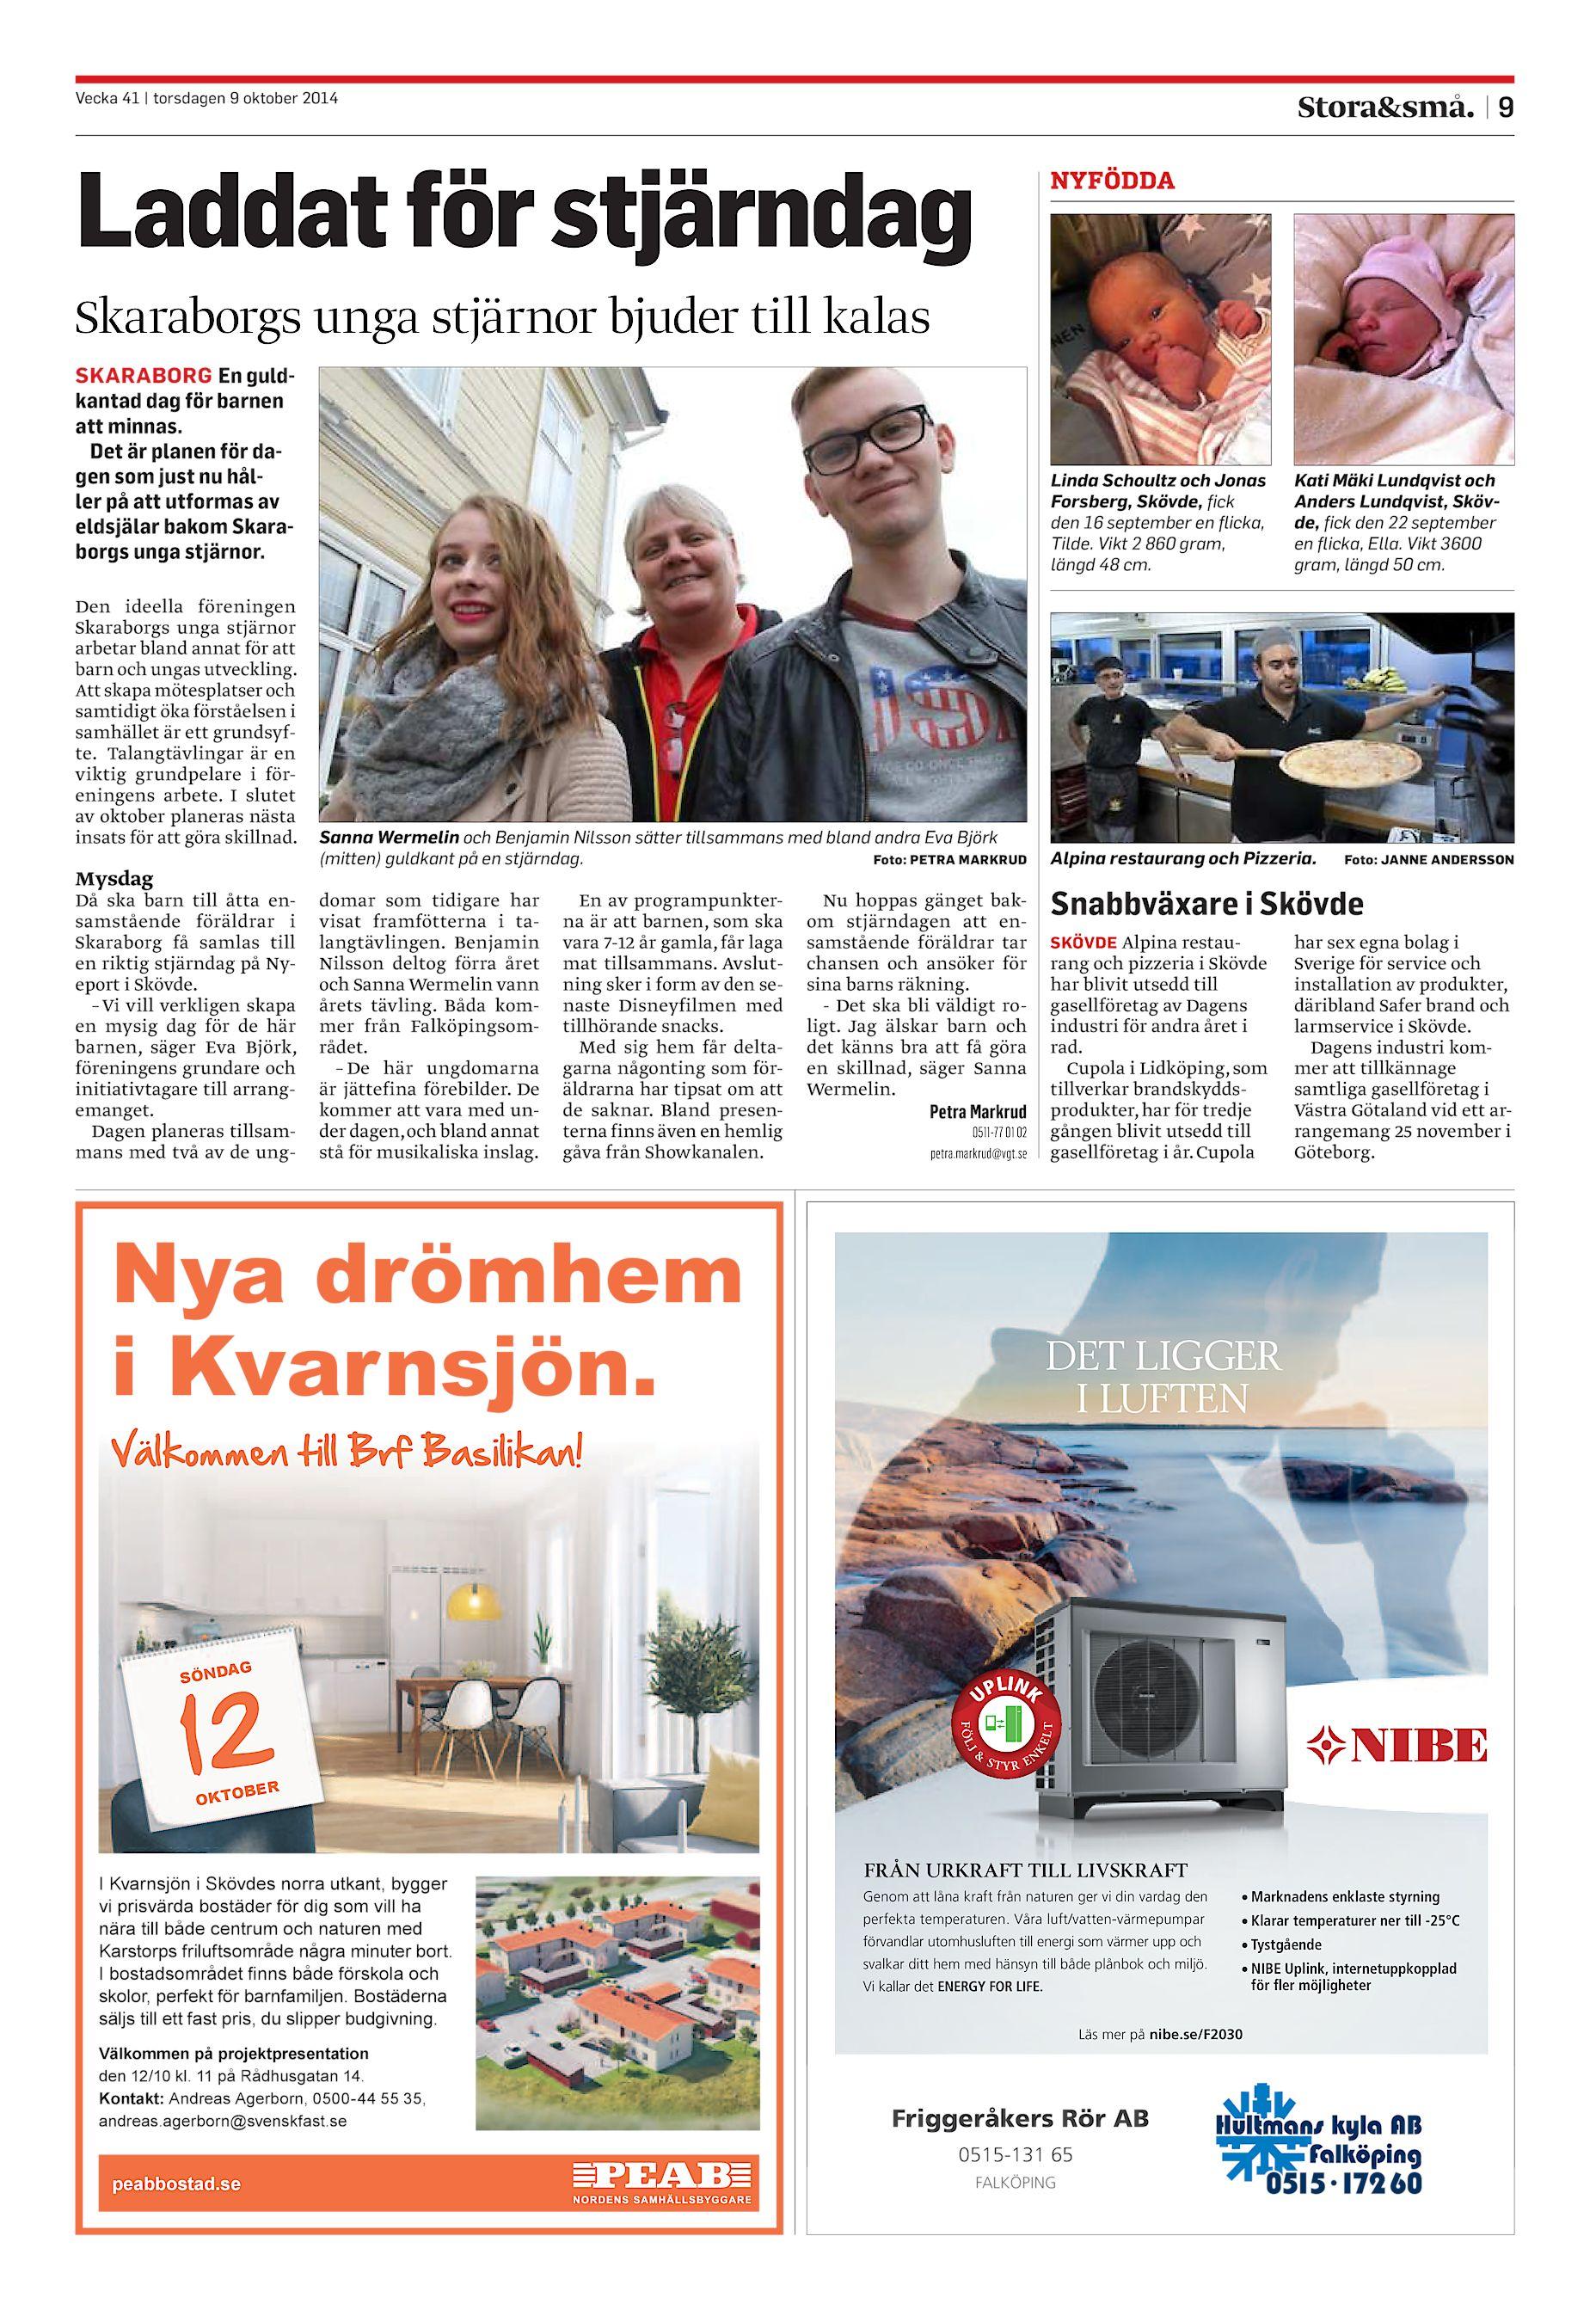 Skvde Nyheter 2012-08-23 by Skvde Nyheter - issuu